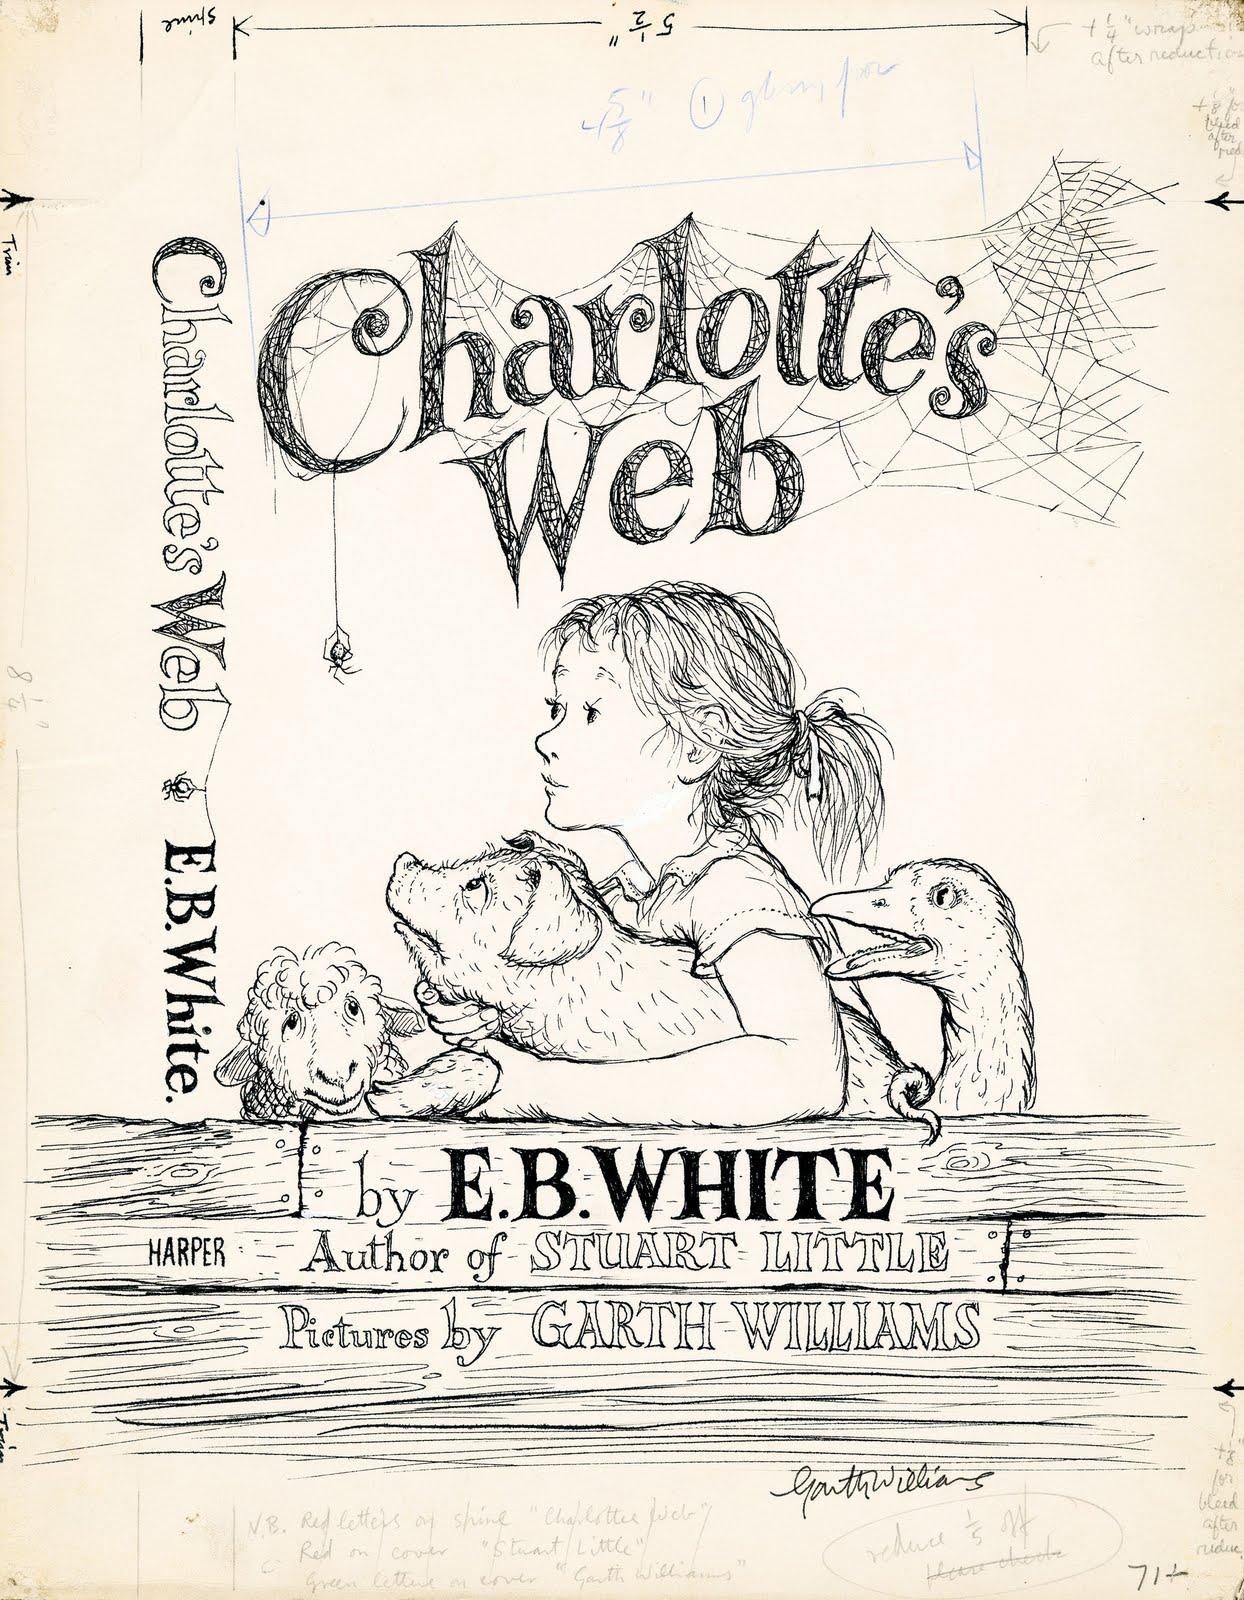 Charlotte S Web Garth Williams